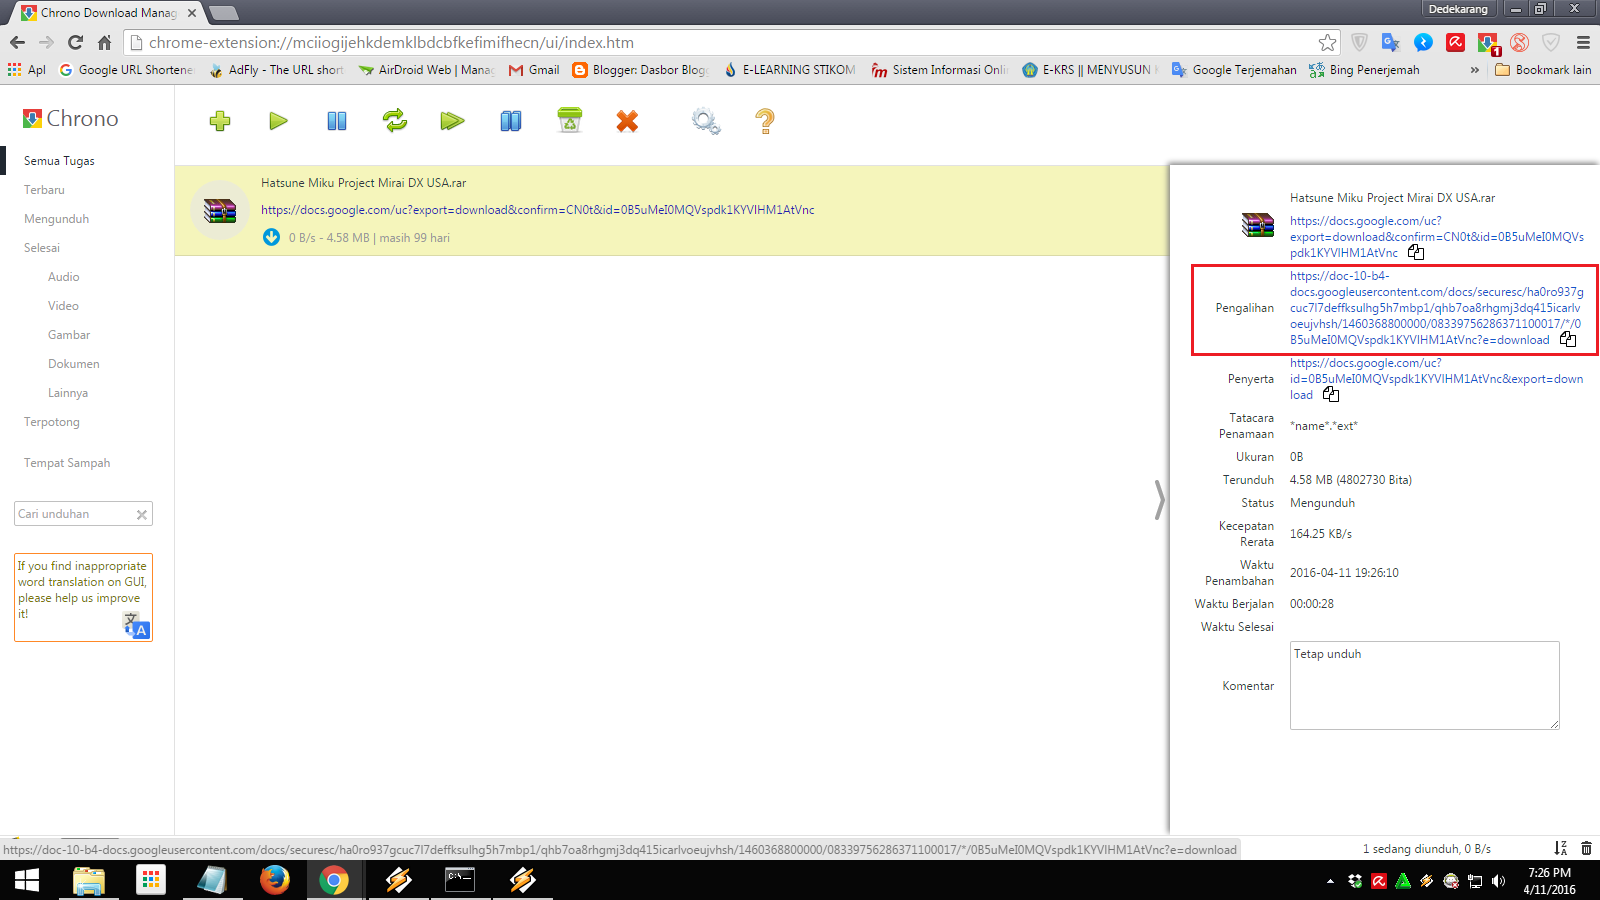 google drive document download link